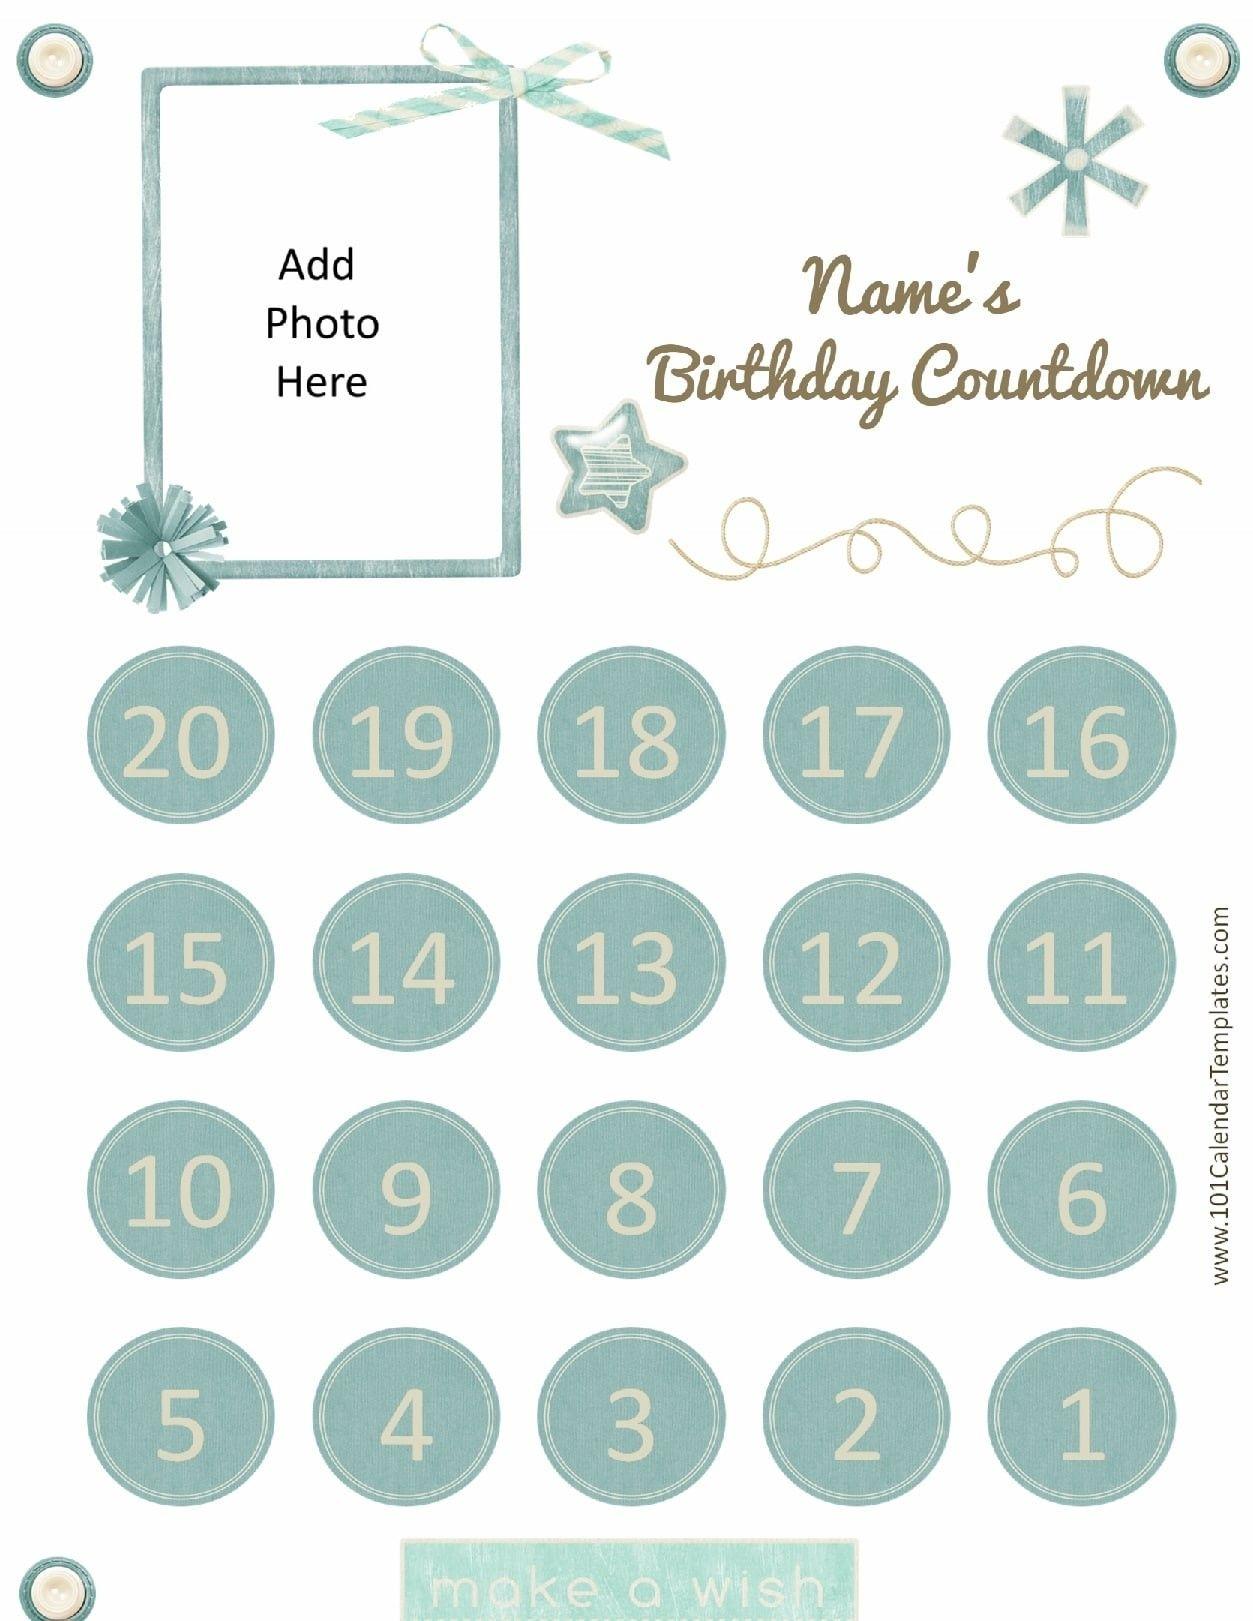 Awesome Printable Birthday Countdown Calendar | Free